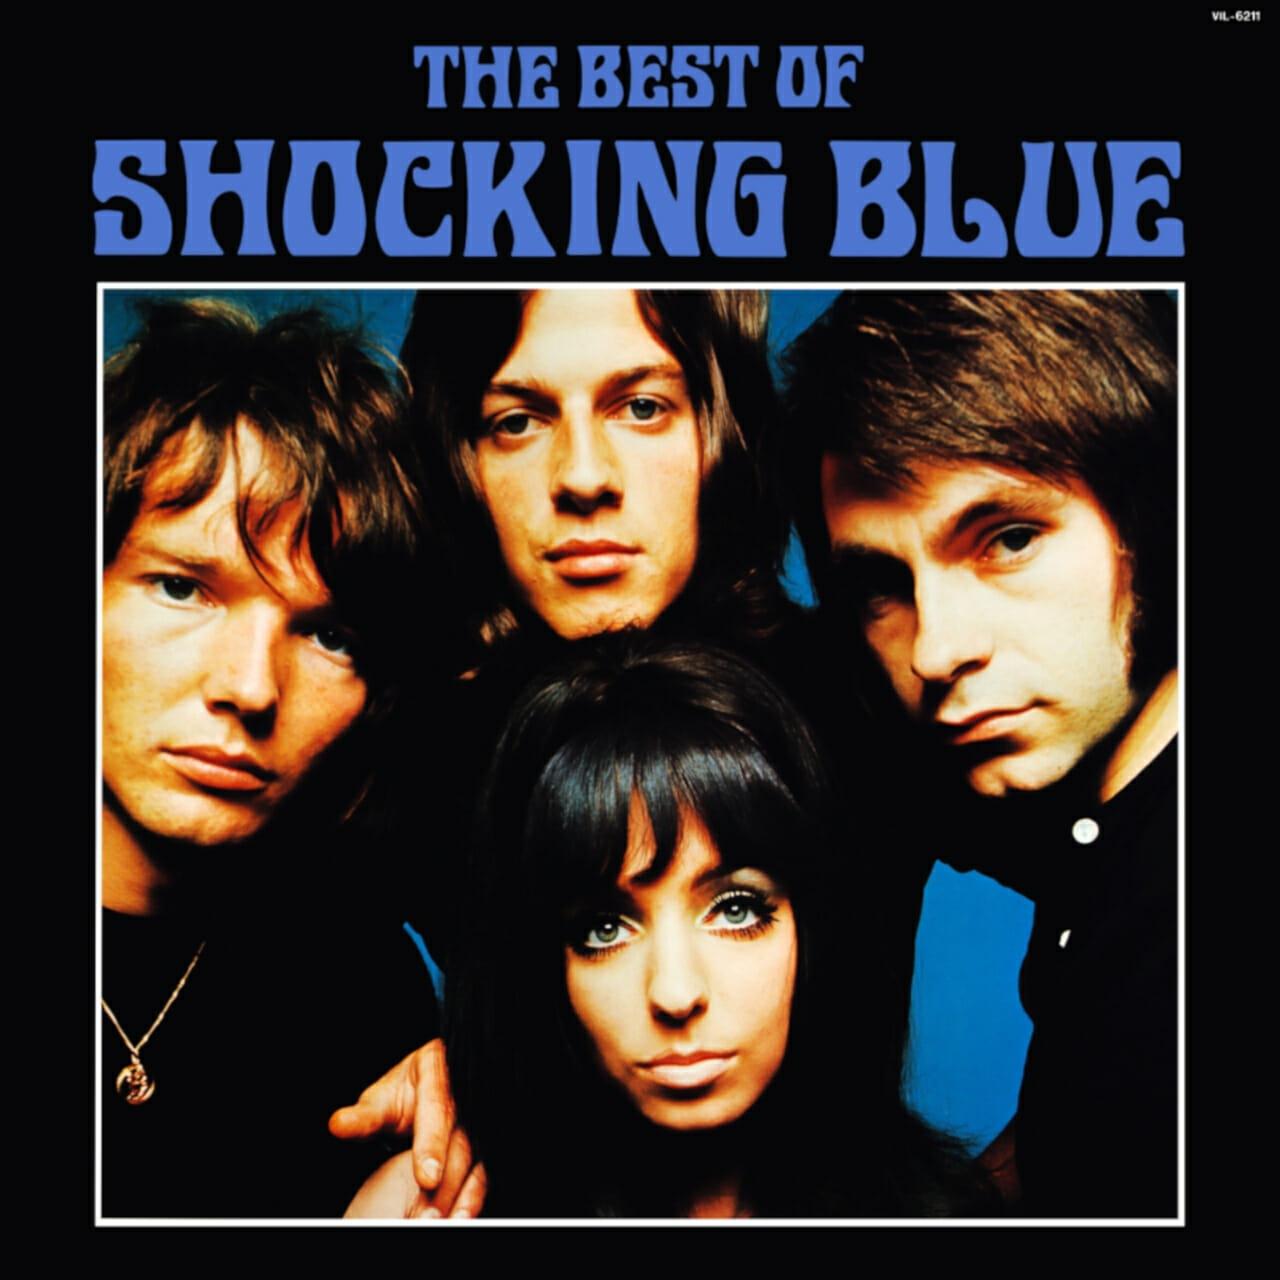 Shocking Blue Vinil Cover